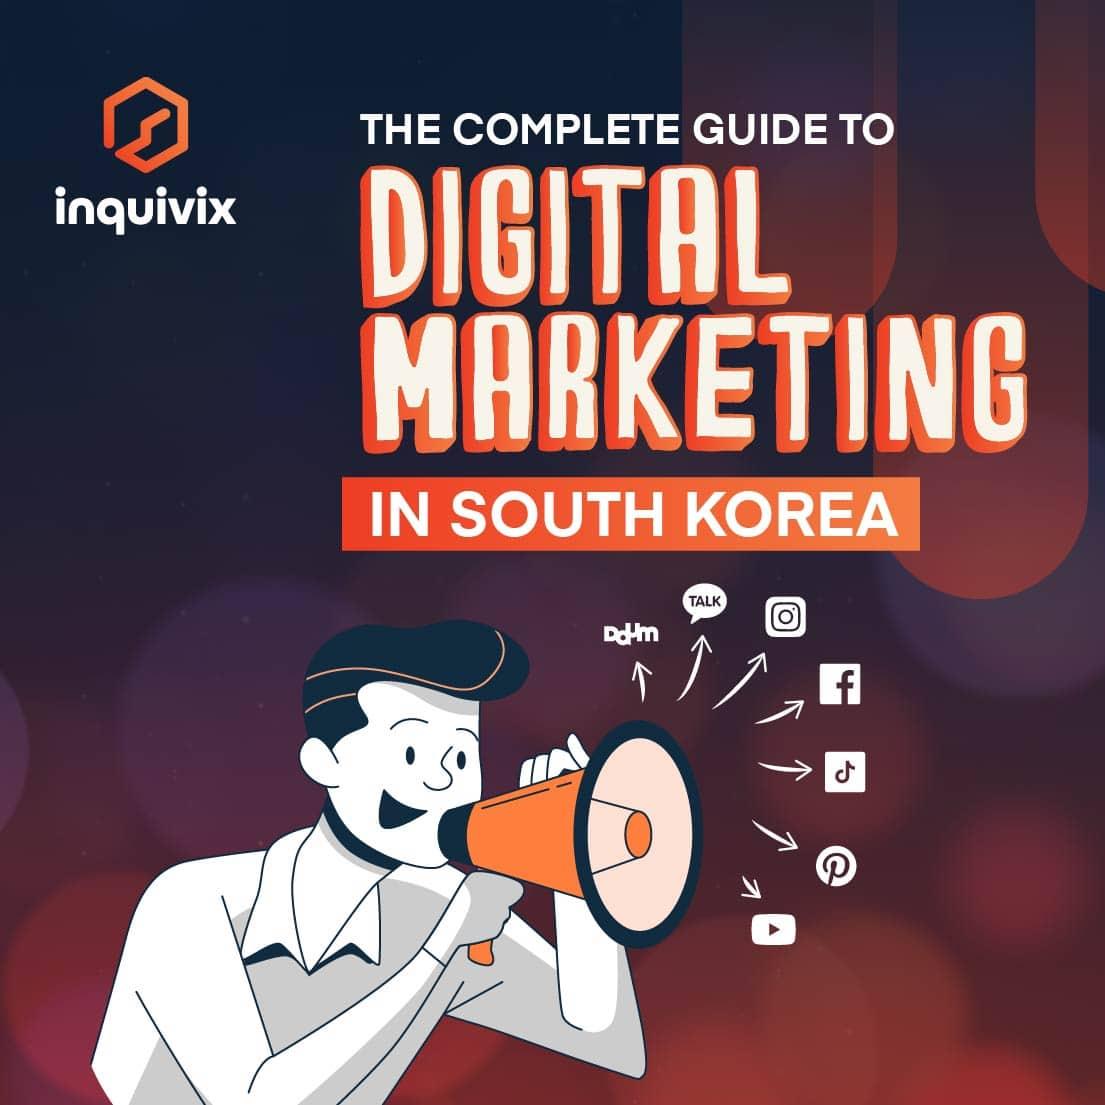 Digital marketing in south korea